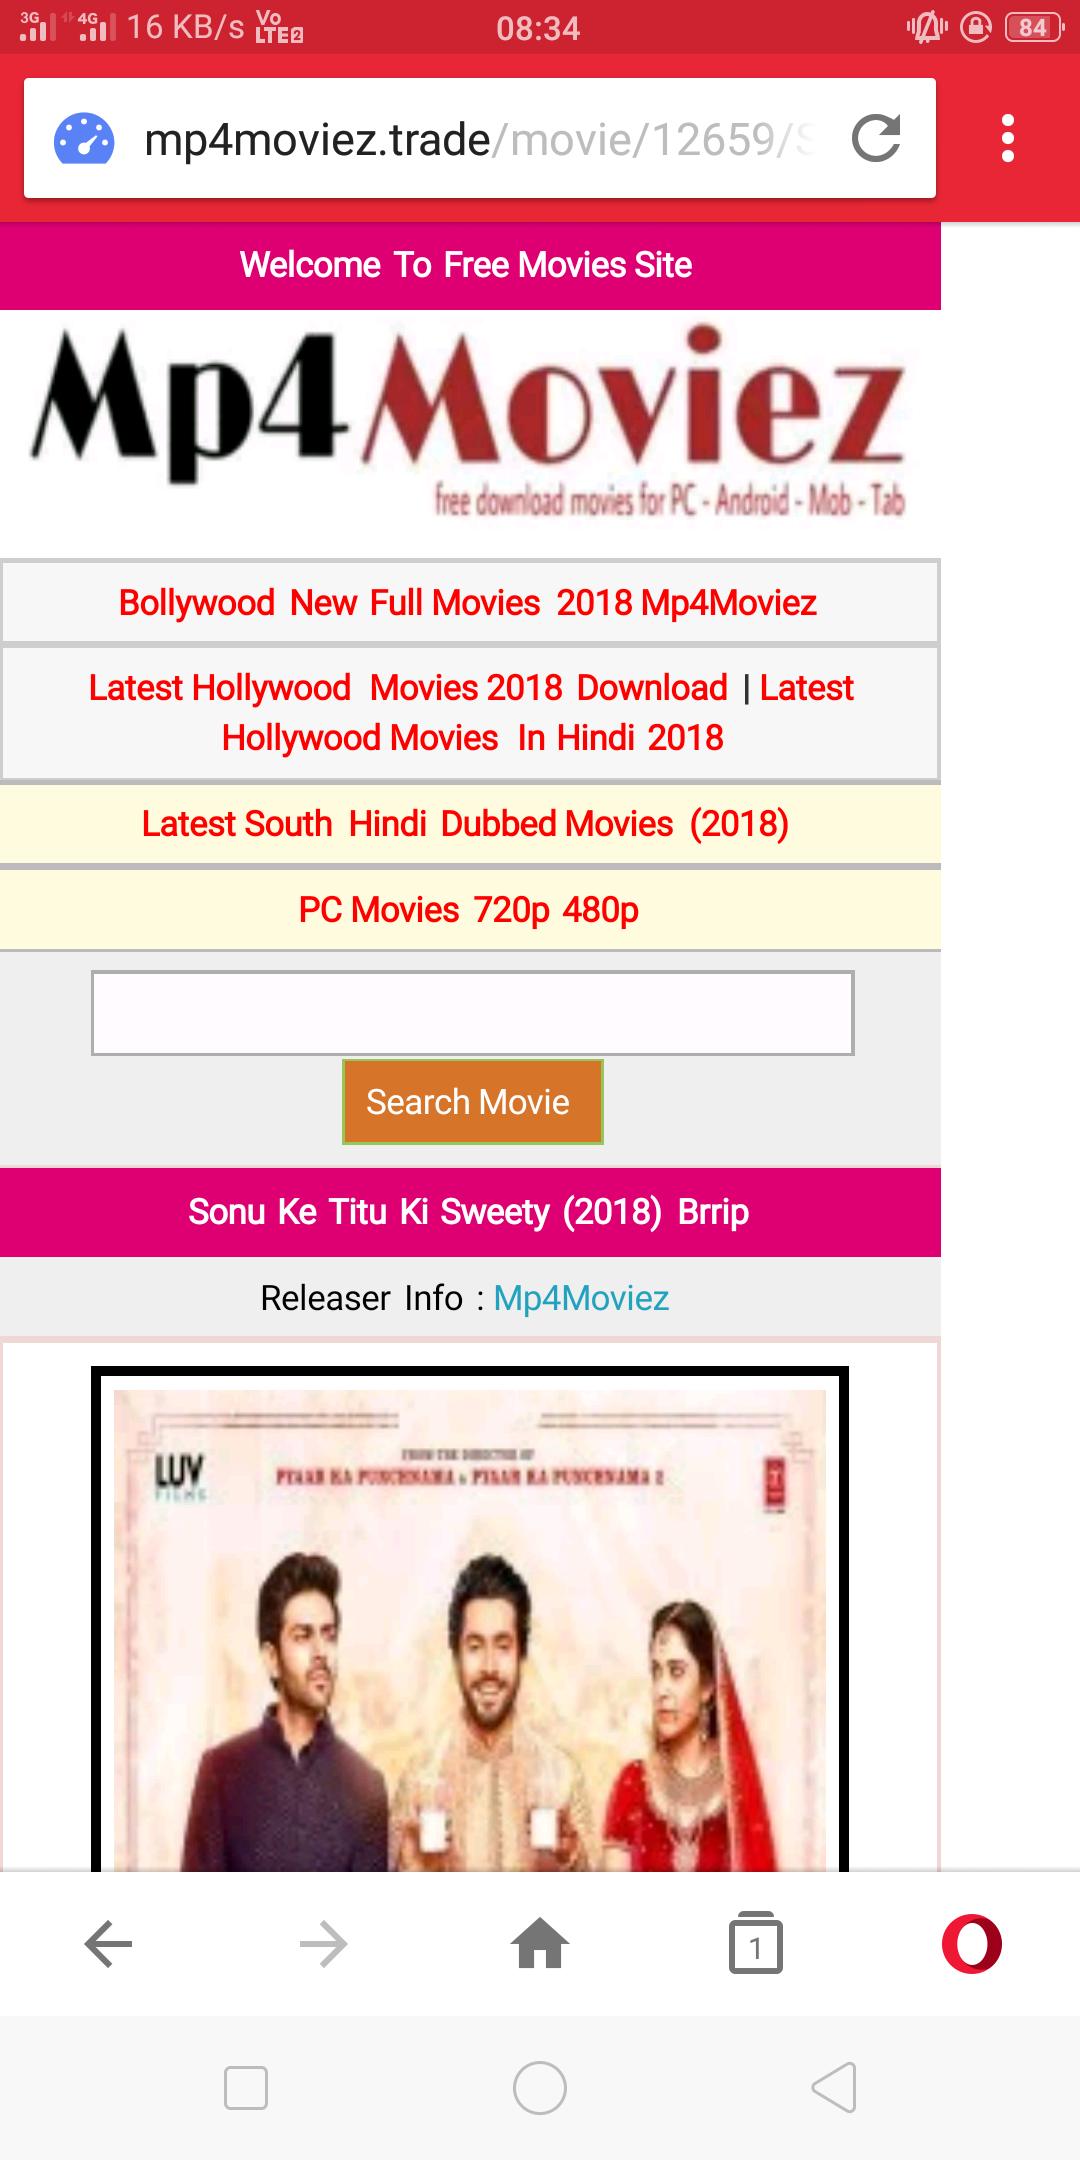 bollywood movies download mp4moviez.com